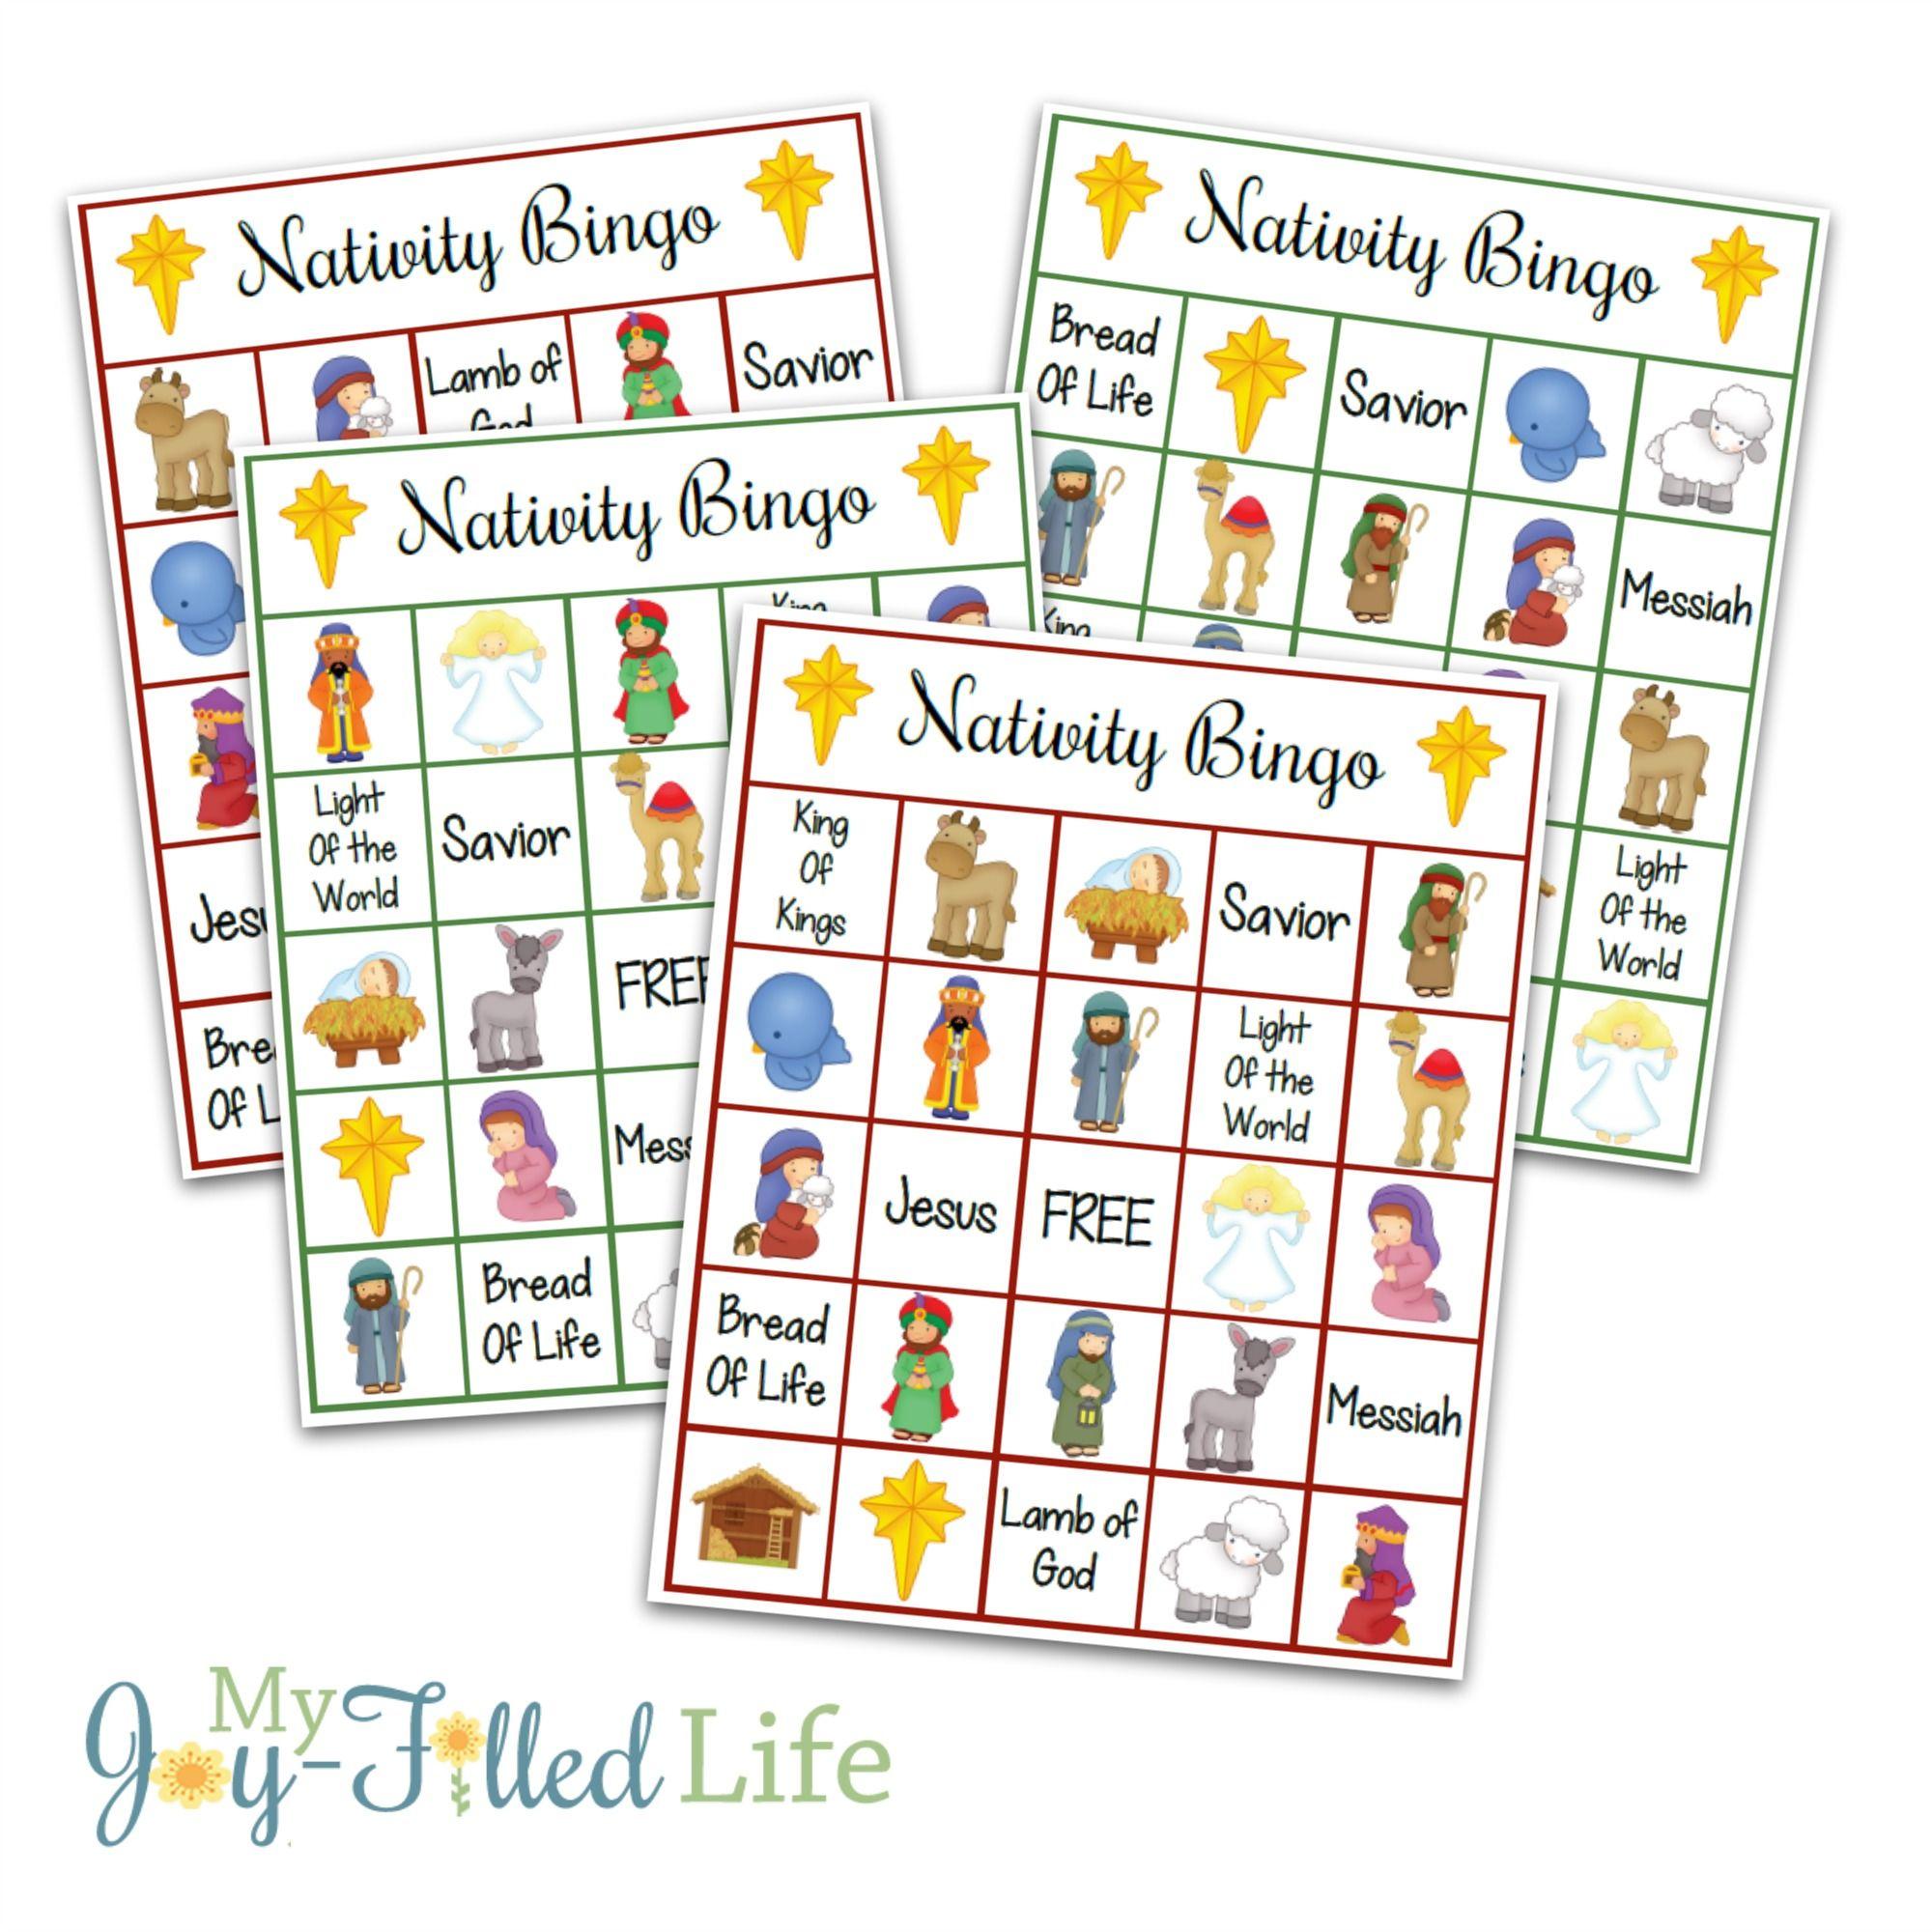 Printable Nativity Bingo | Games | Pinterest | Nativity Bingo - Free Printable Bible Bingo For Preschoolers